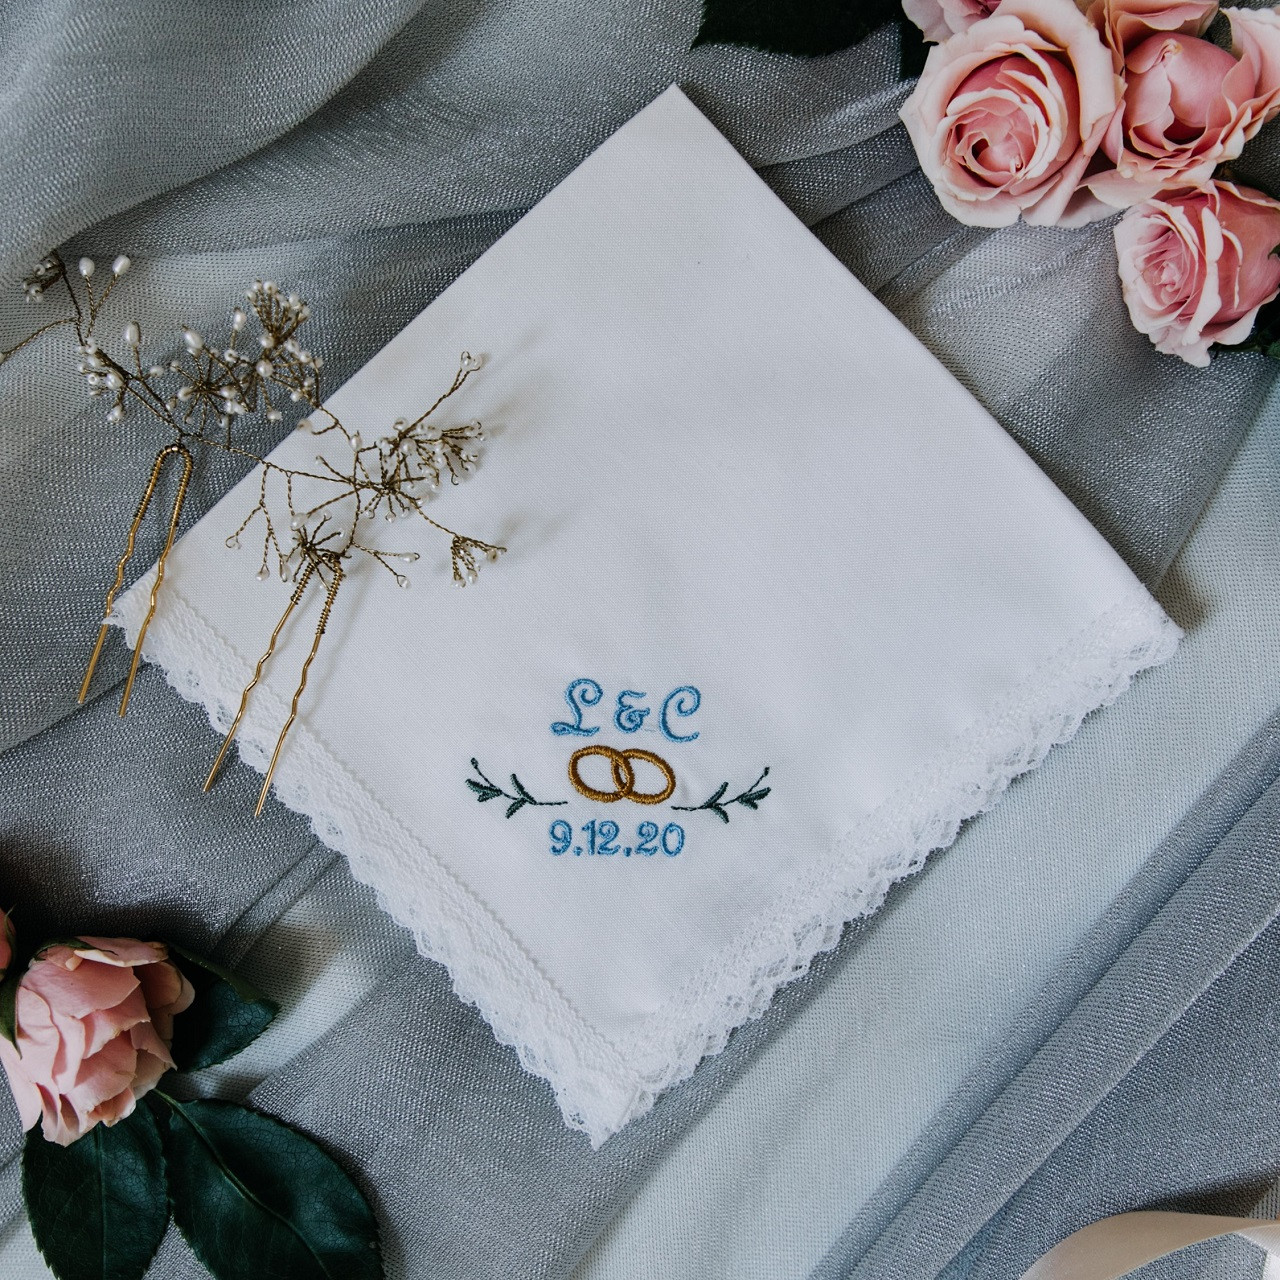 Something Blue Wedding Handkerchief Monogrammed The Handkerchief Shop